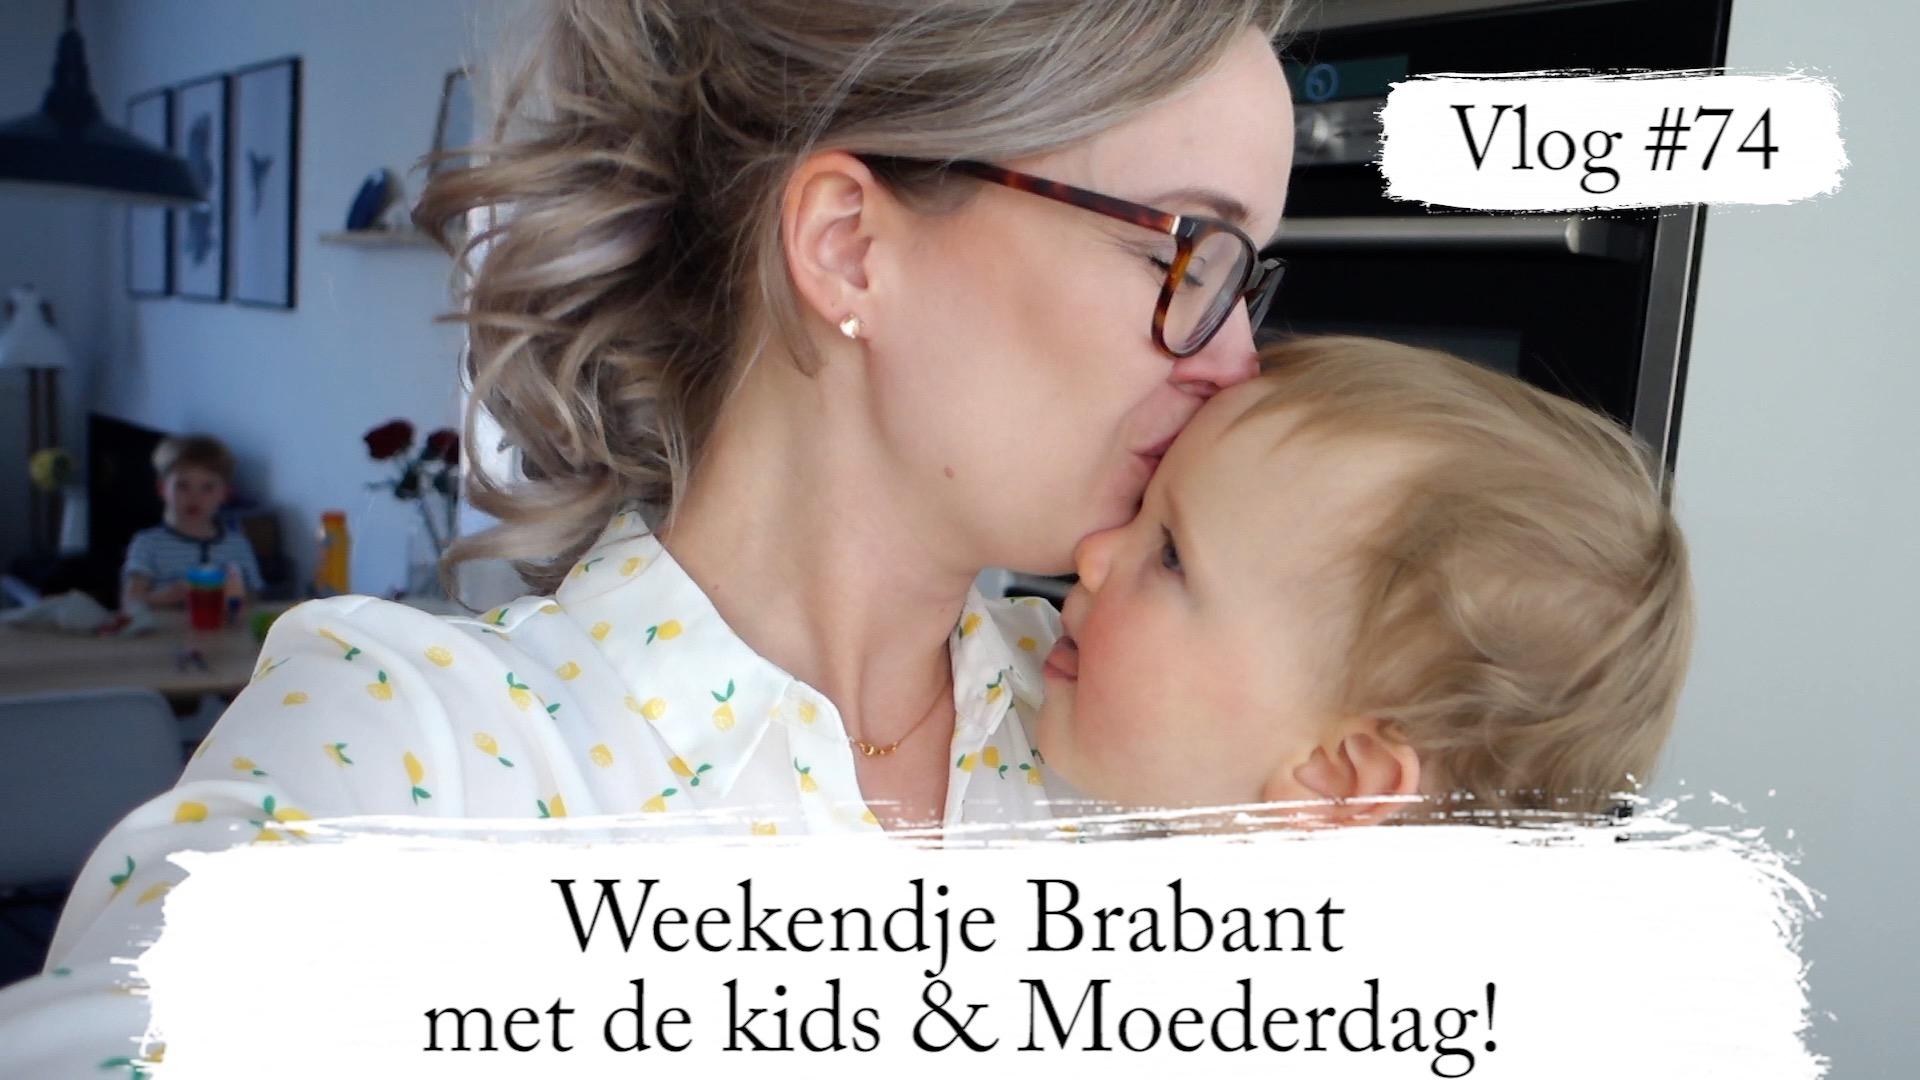 Still optie 2 vlog 74 Elise Joanne - Vlog 74: Weekendje weg met de kids + Moederdag vieren!